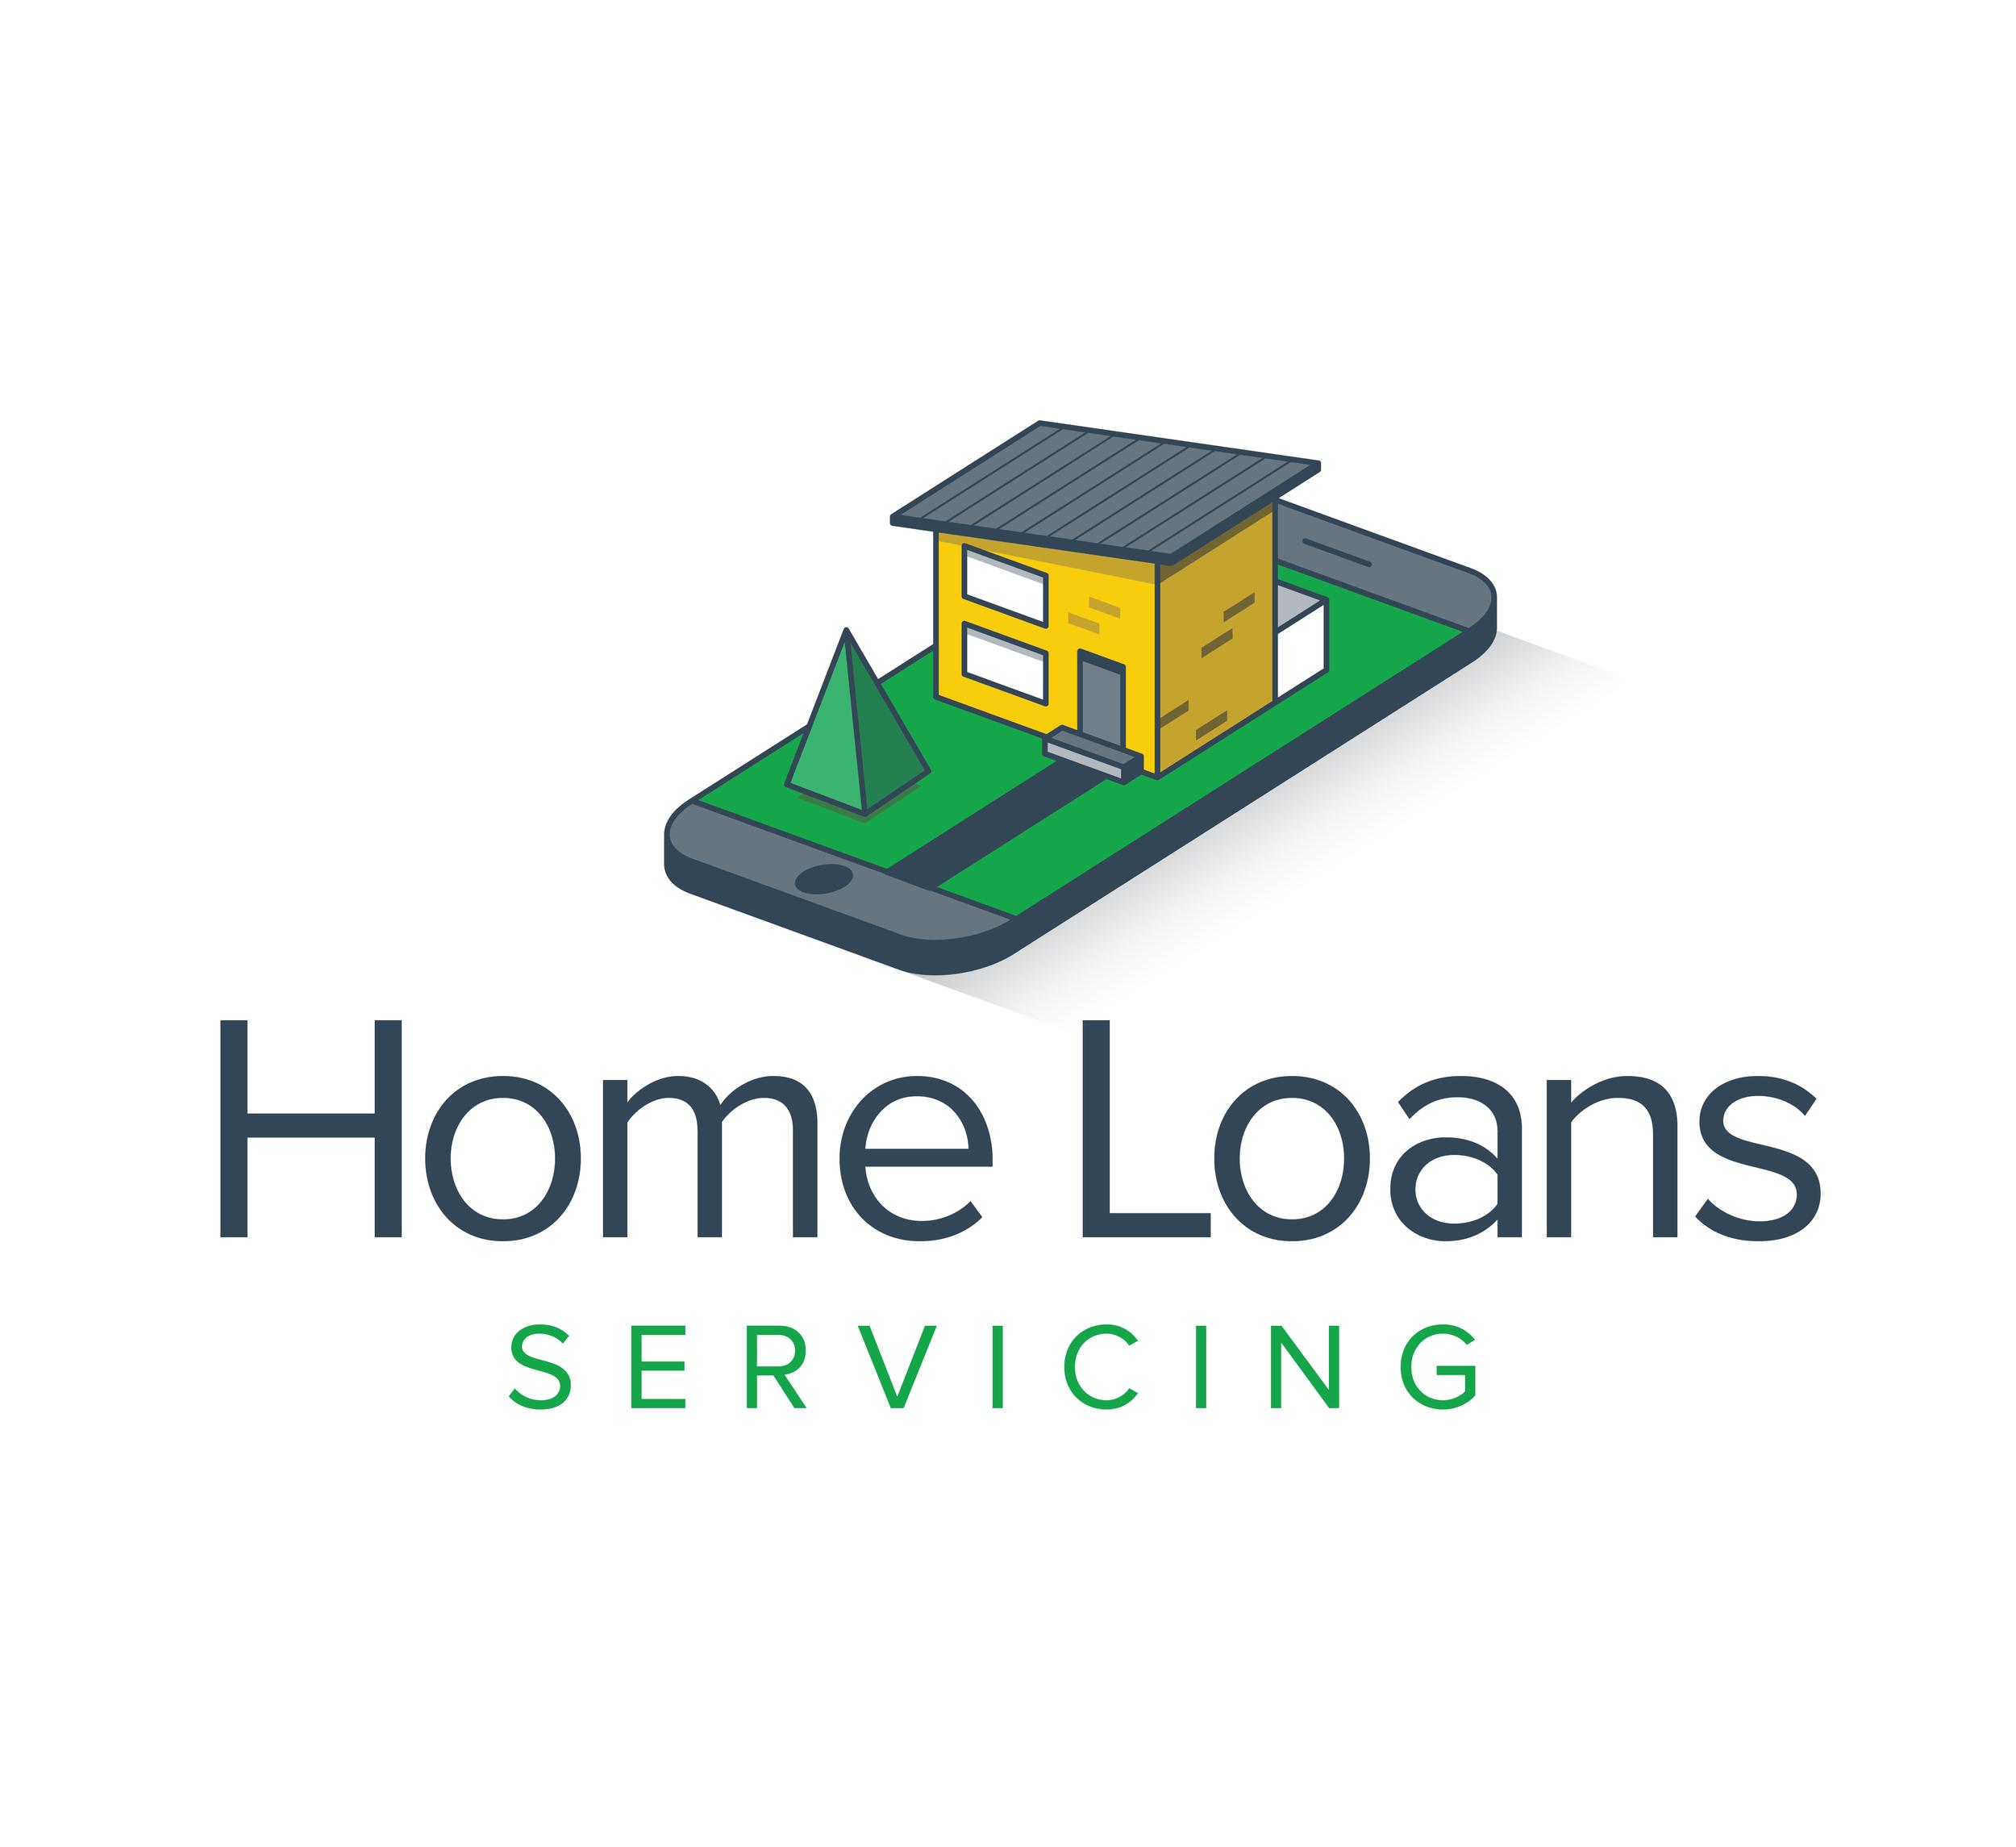 Home Loans Digital Logo-OL-01.png